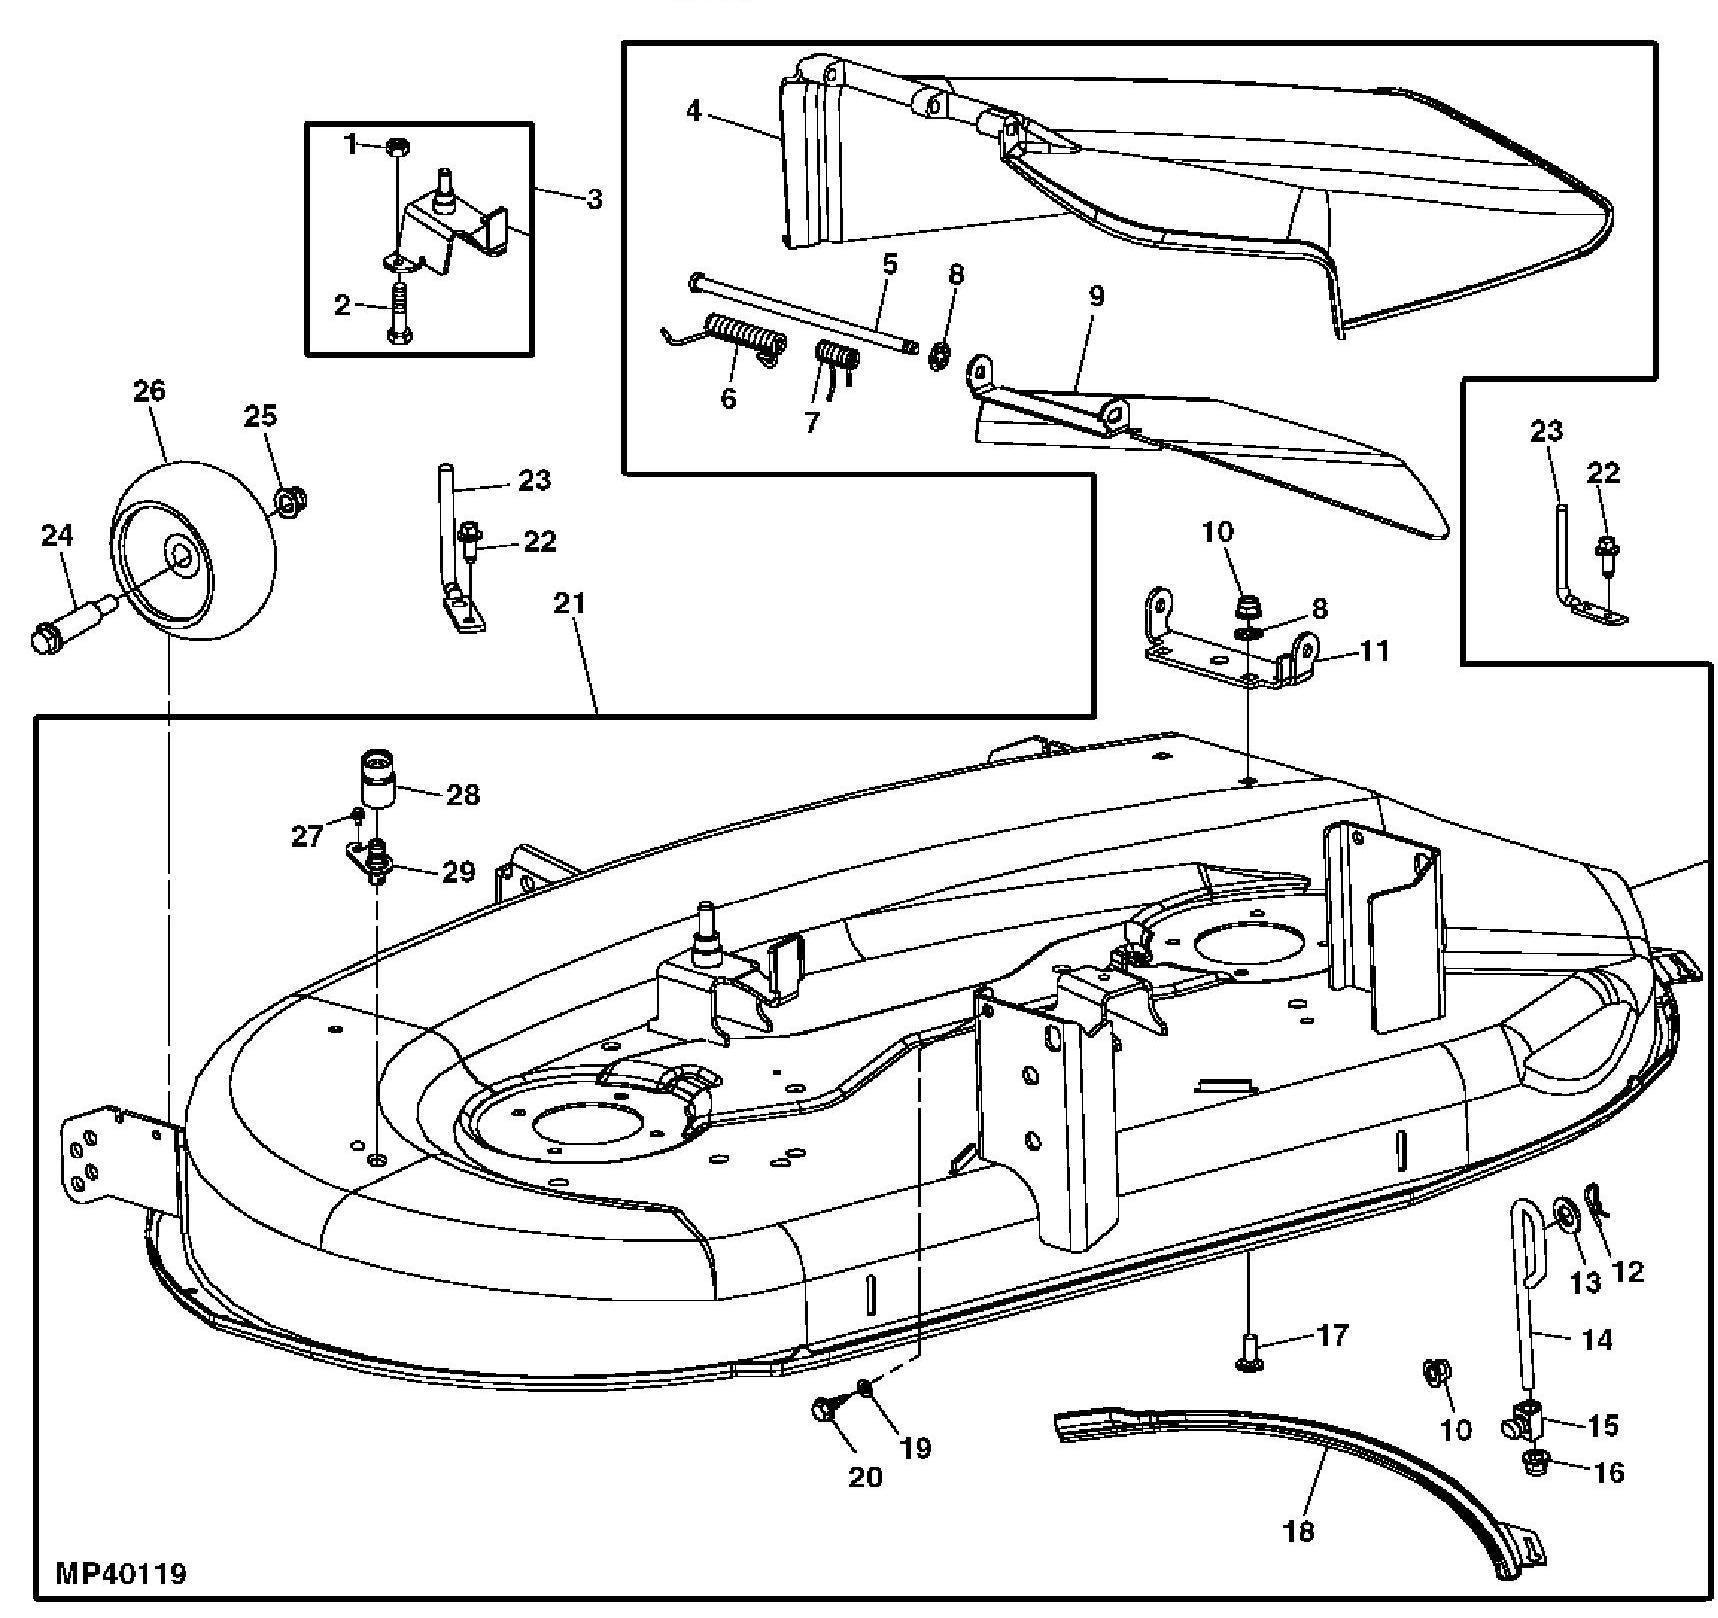 [BM_6384] John Deere X110 Deck Exploded Parts Diagram